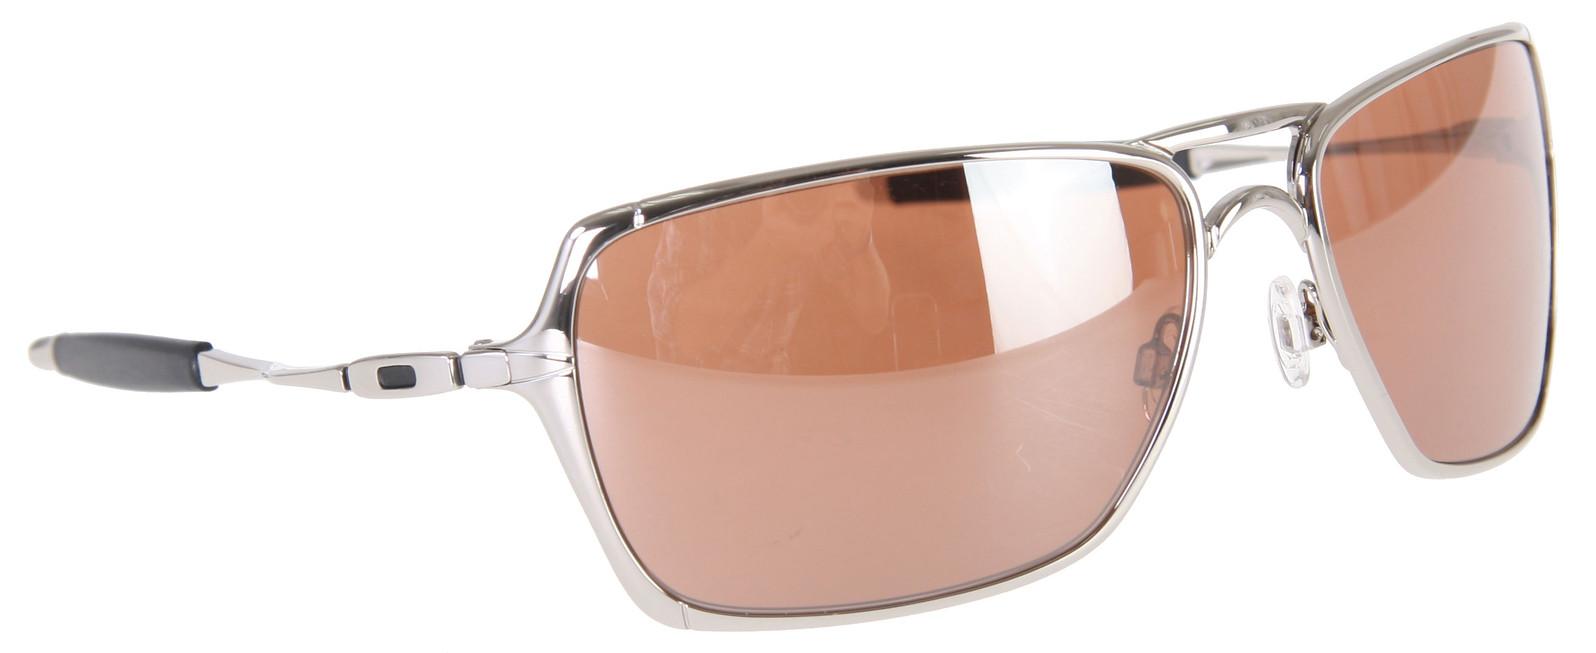 989f9f96e7 Oakley Inmate Sunglasses Polished Chrome Vr28 Black Iridium Lens ...